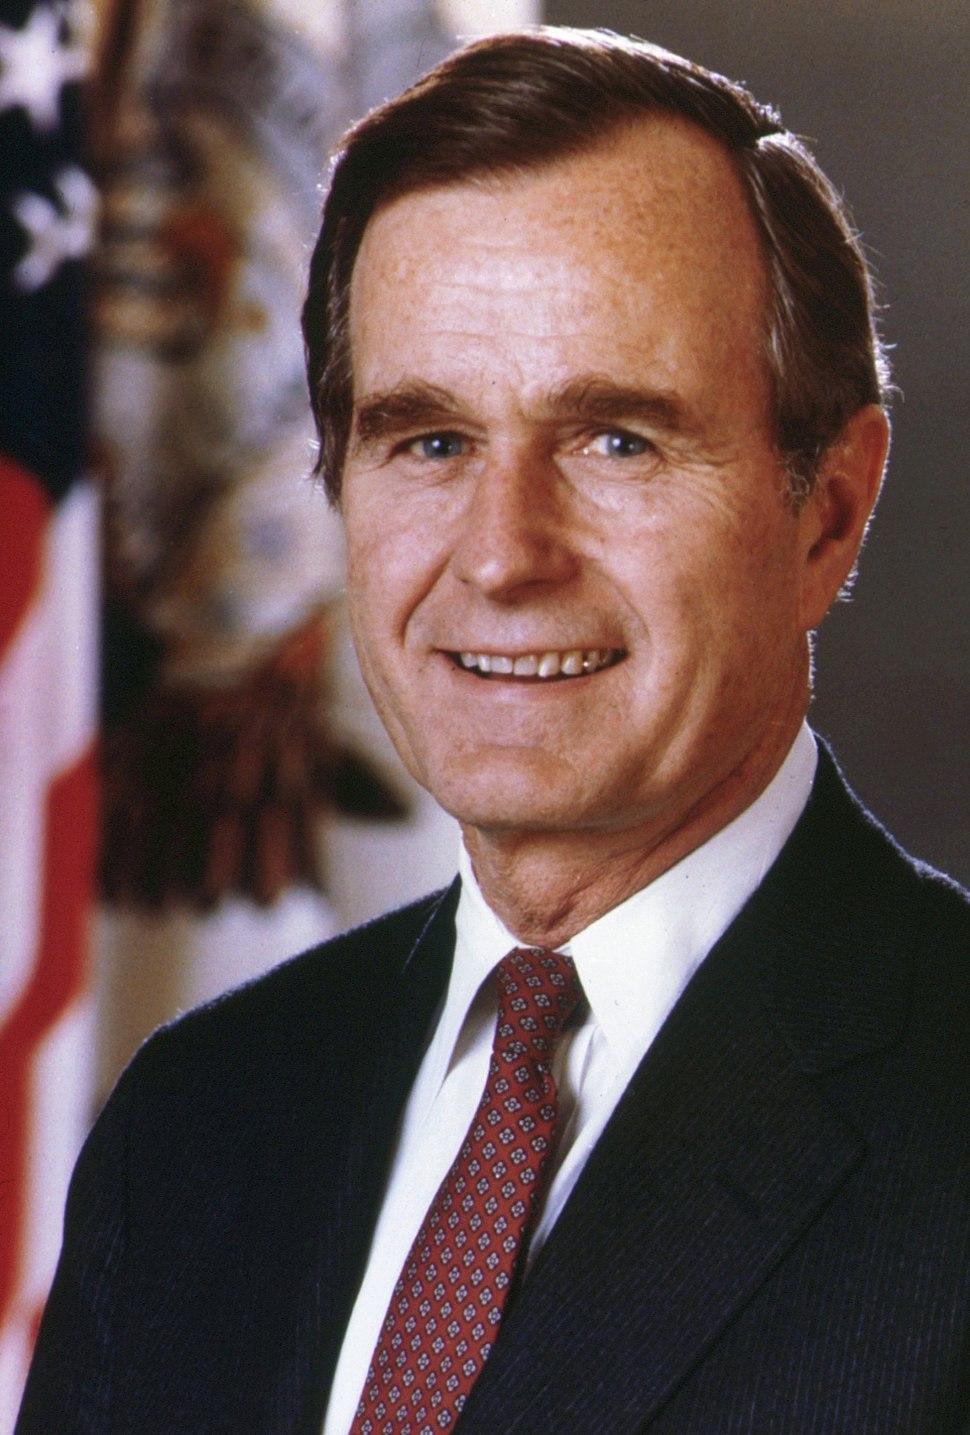 George HW Bush.jpg